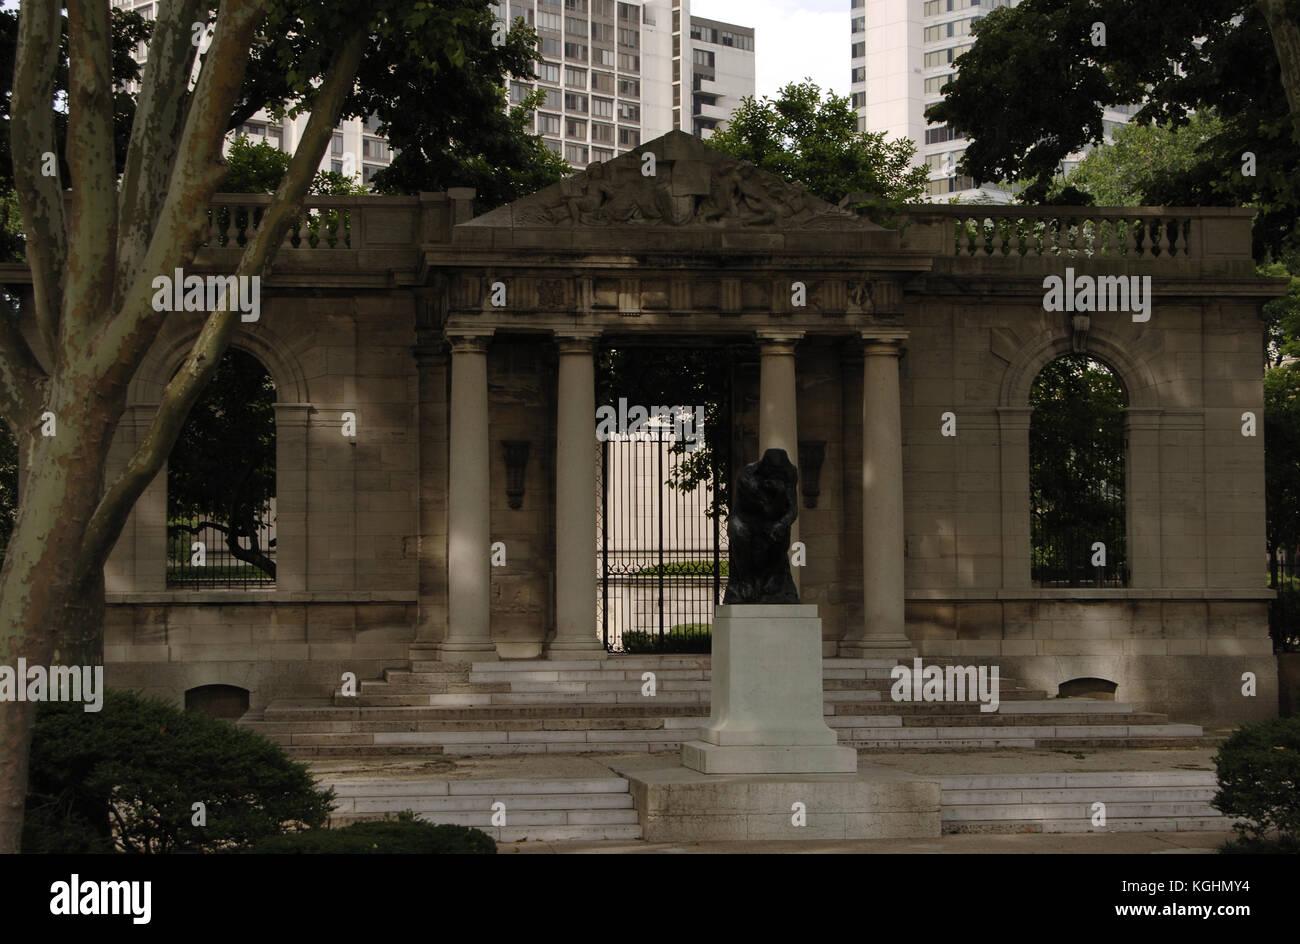 United States Pennsylvania Philadelphia Rodin Museum Exterior